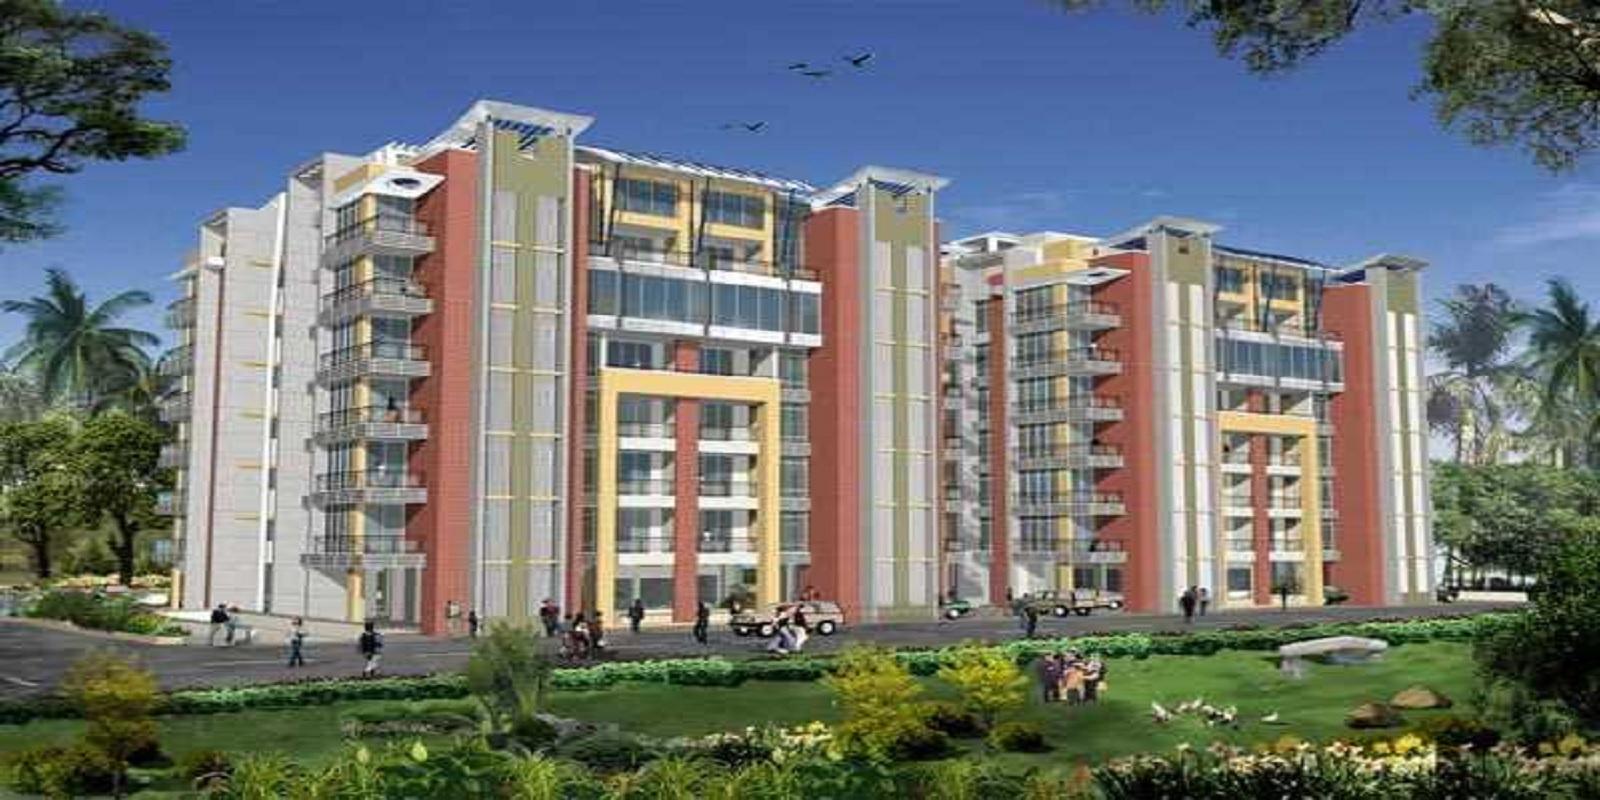 niho marvel scottish garden project project large image1